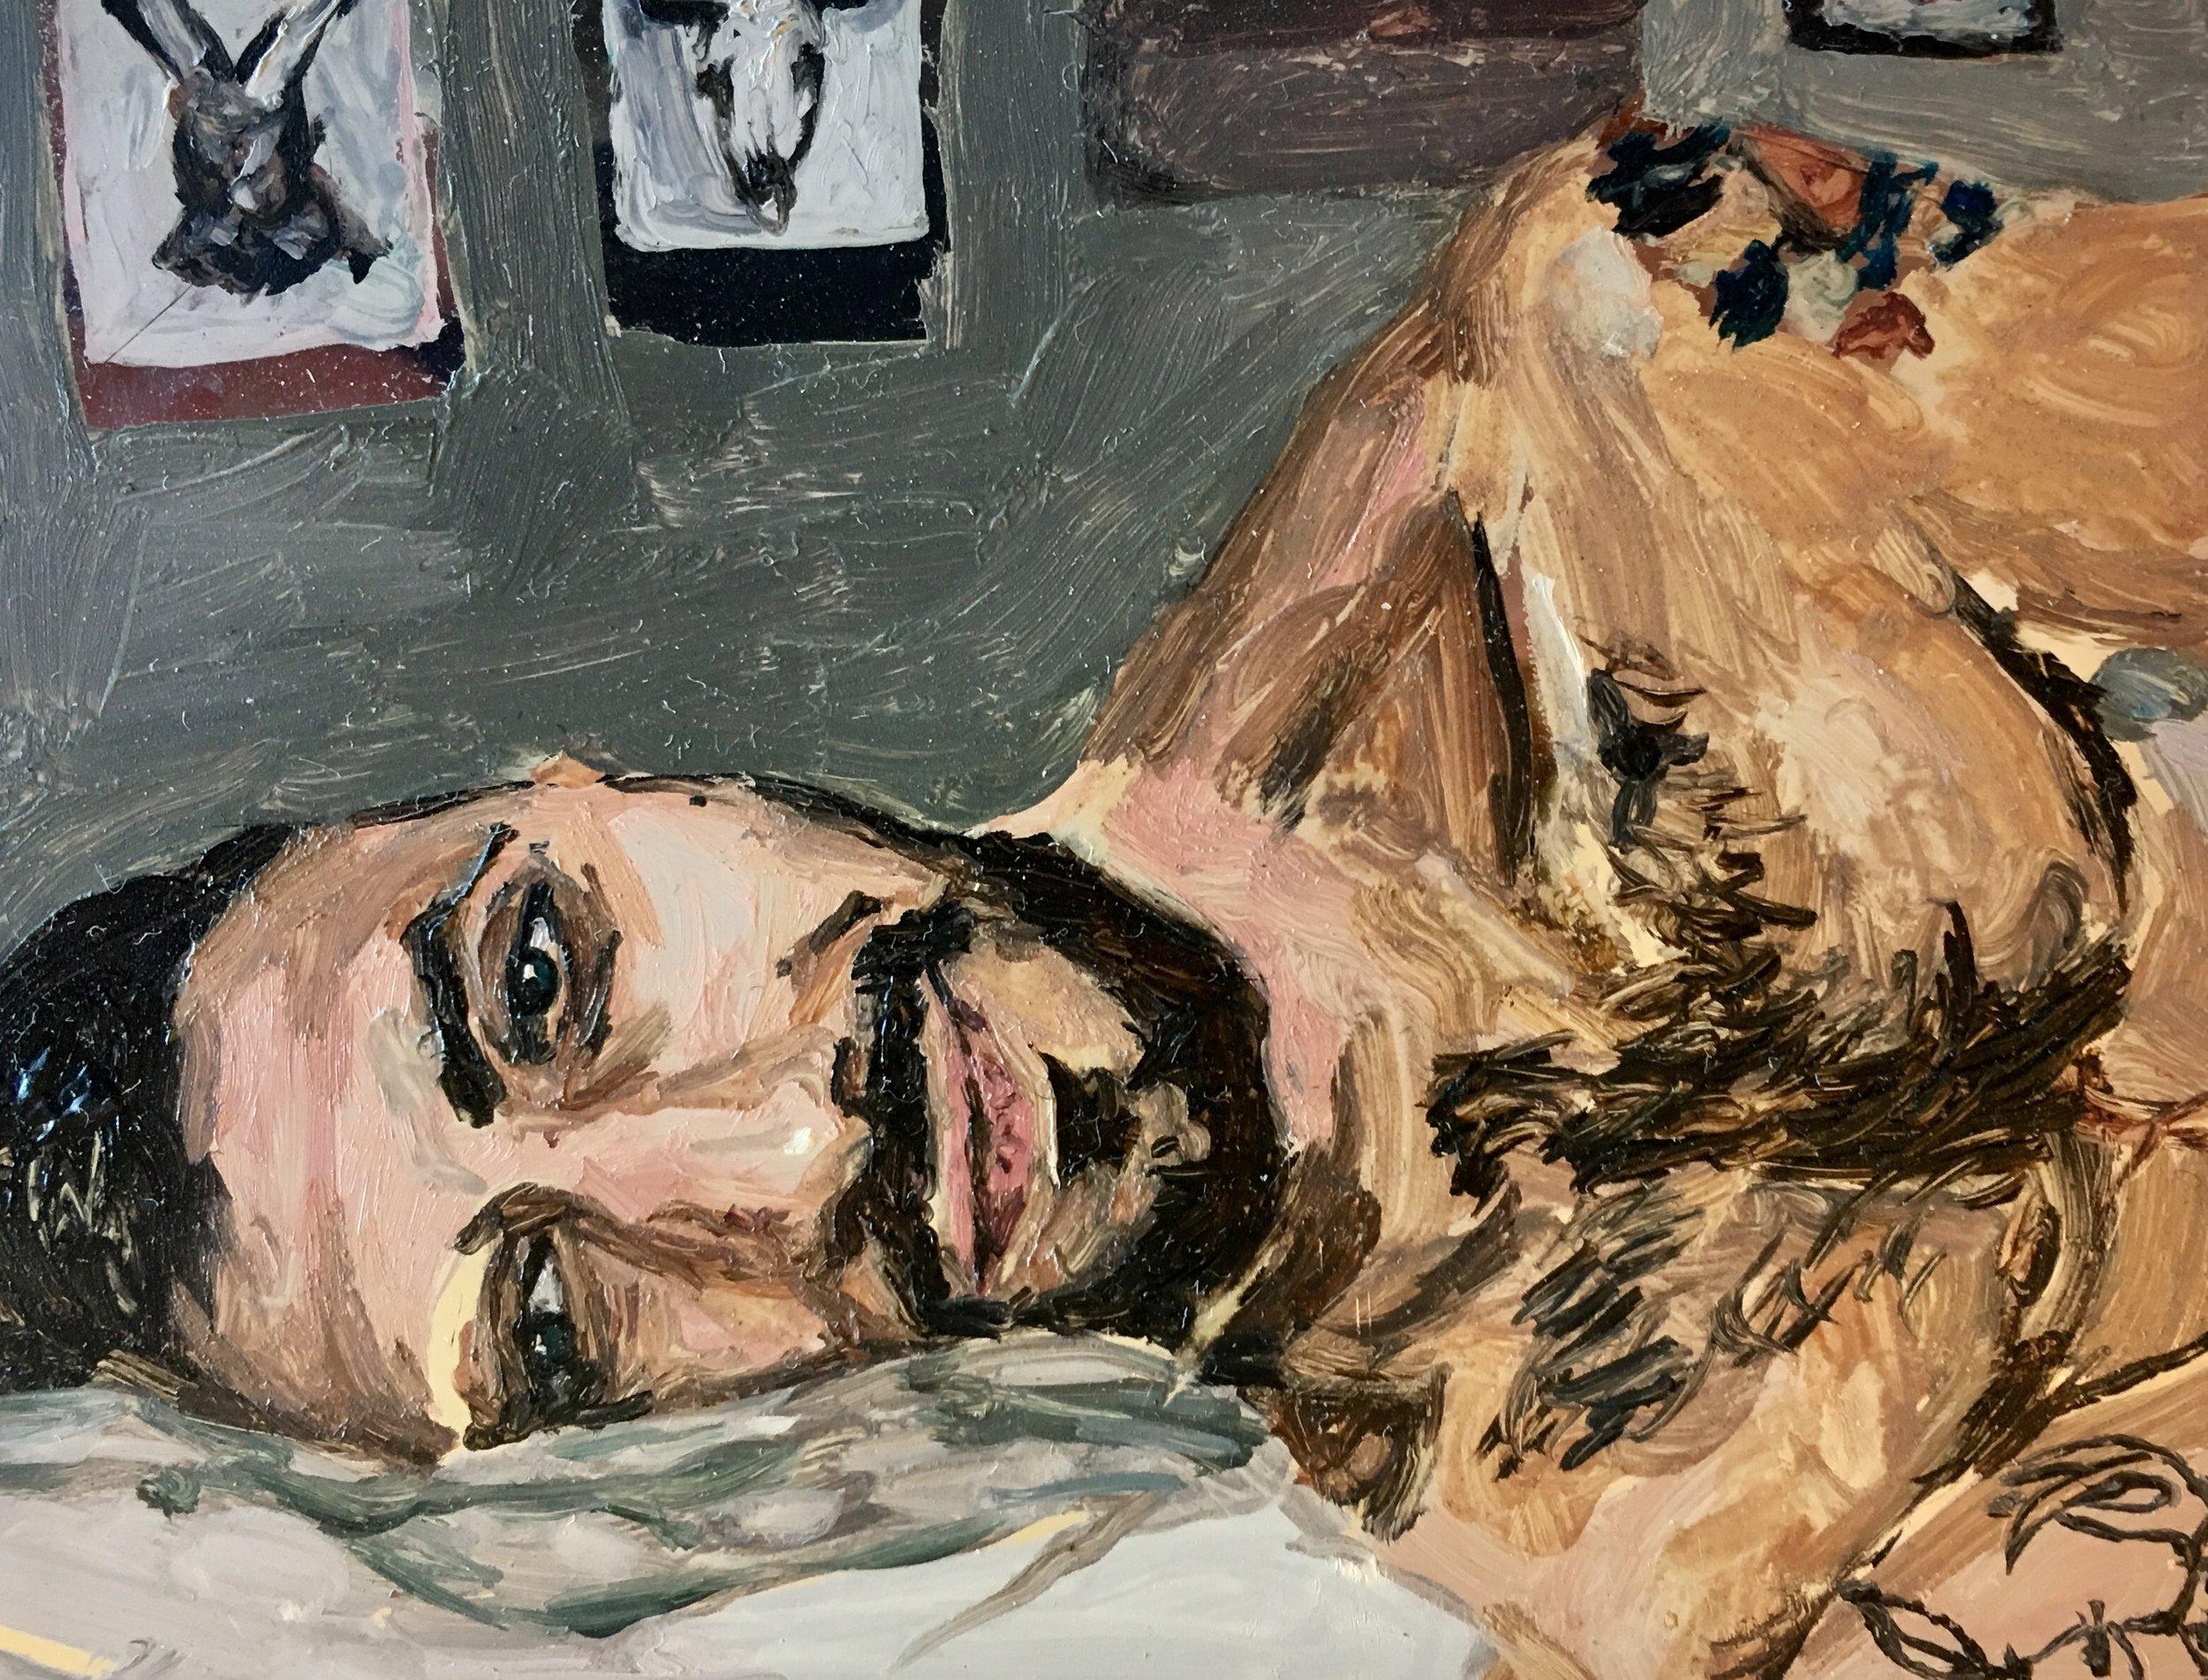 """Portrait of Les"" by Adam Chuckn, 3.25x4in, oil on mylar"